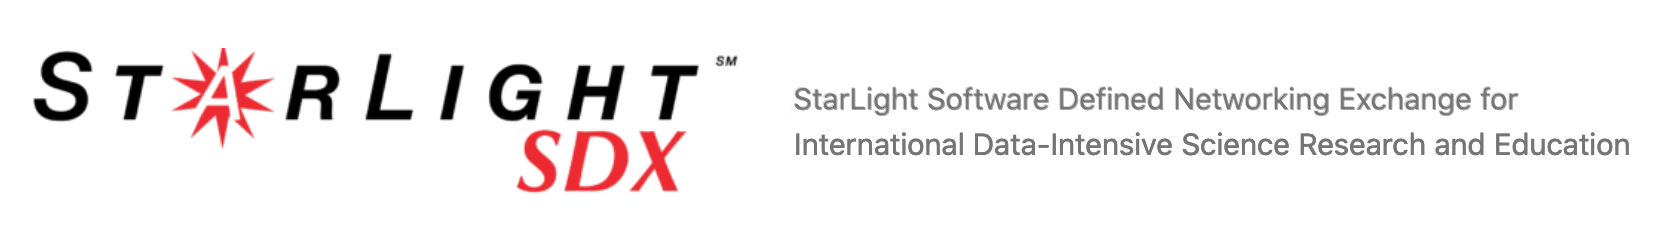 StarLight SDX